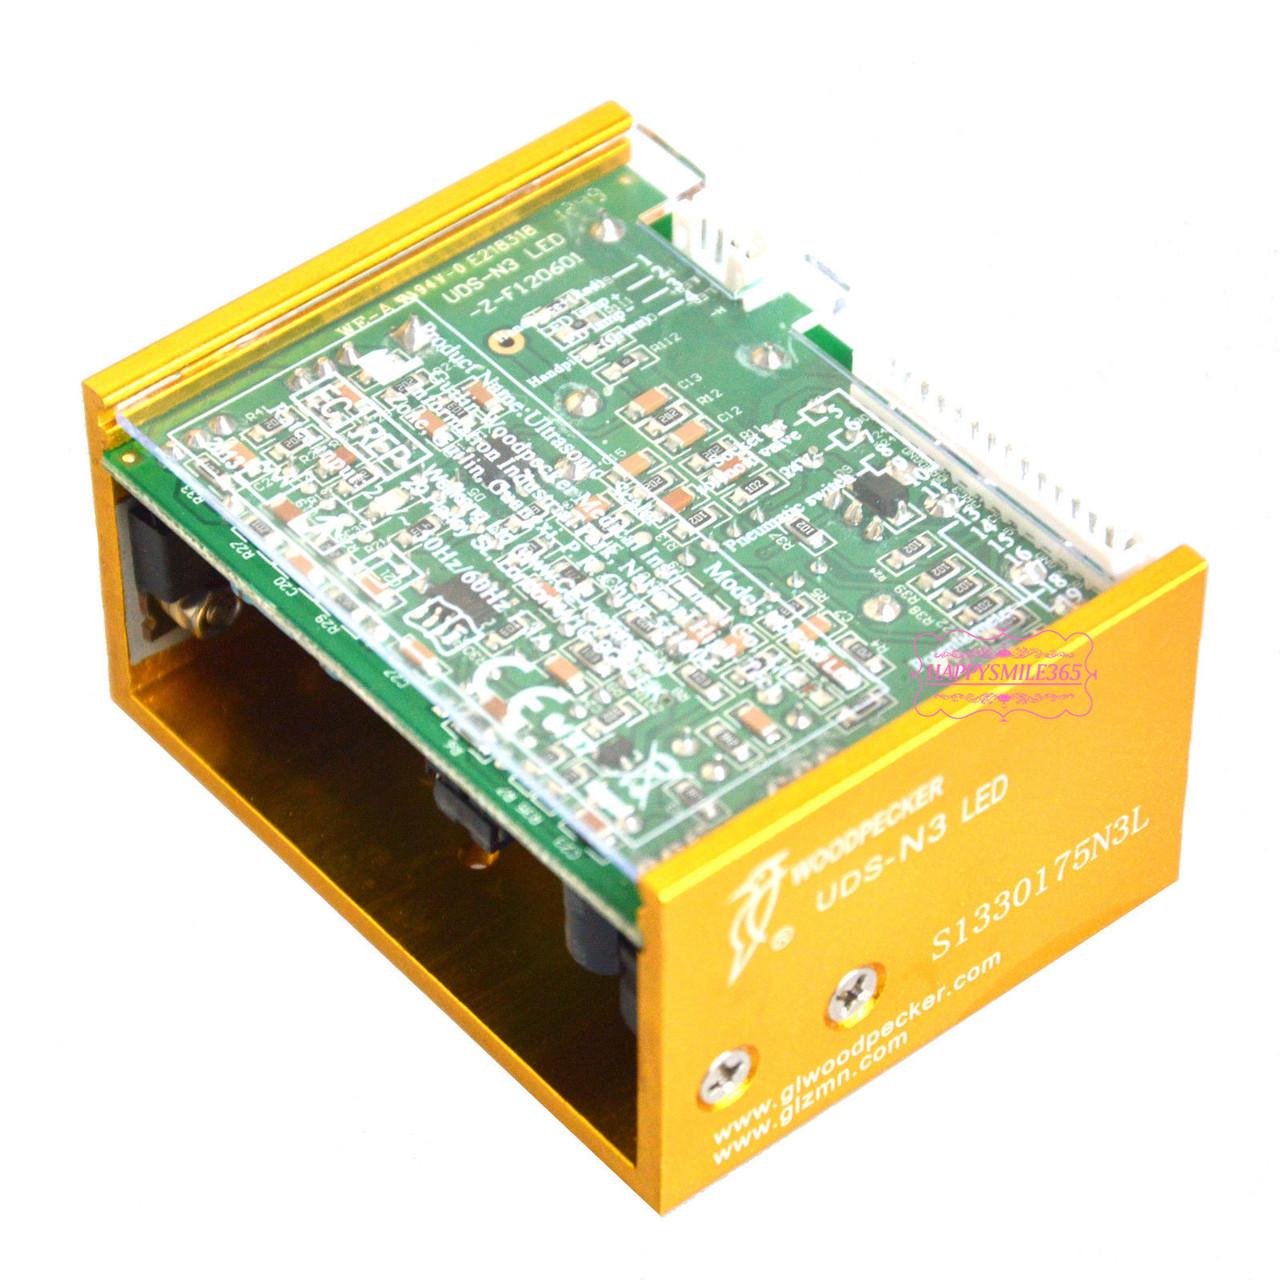 Woodpecker UDS N3 LED скалер ультразвуковой